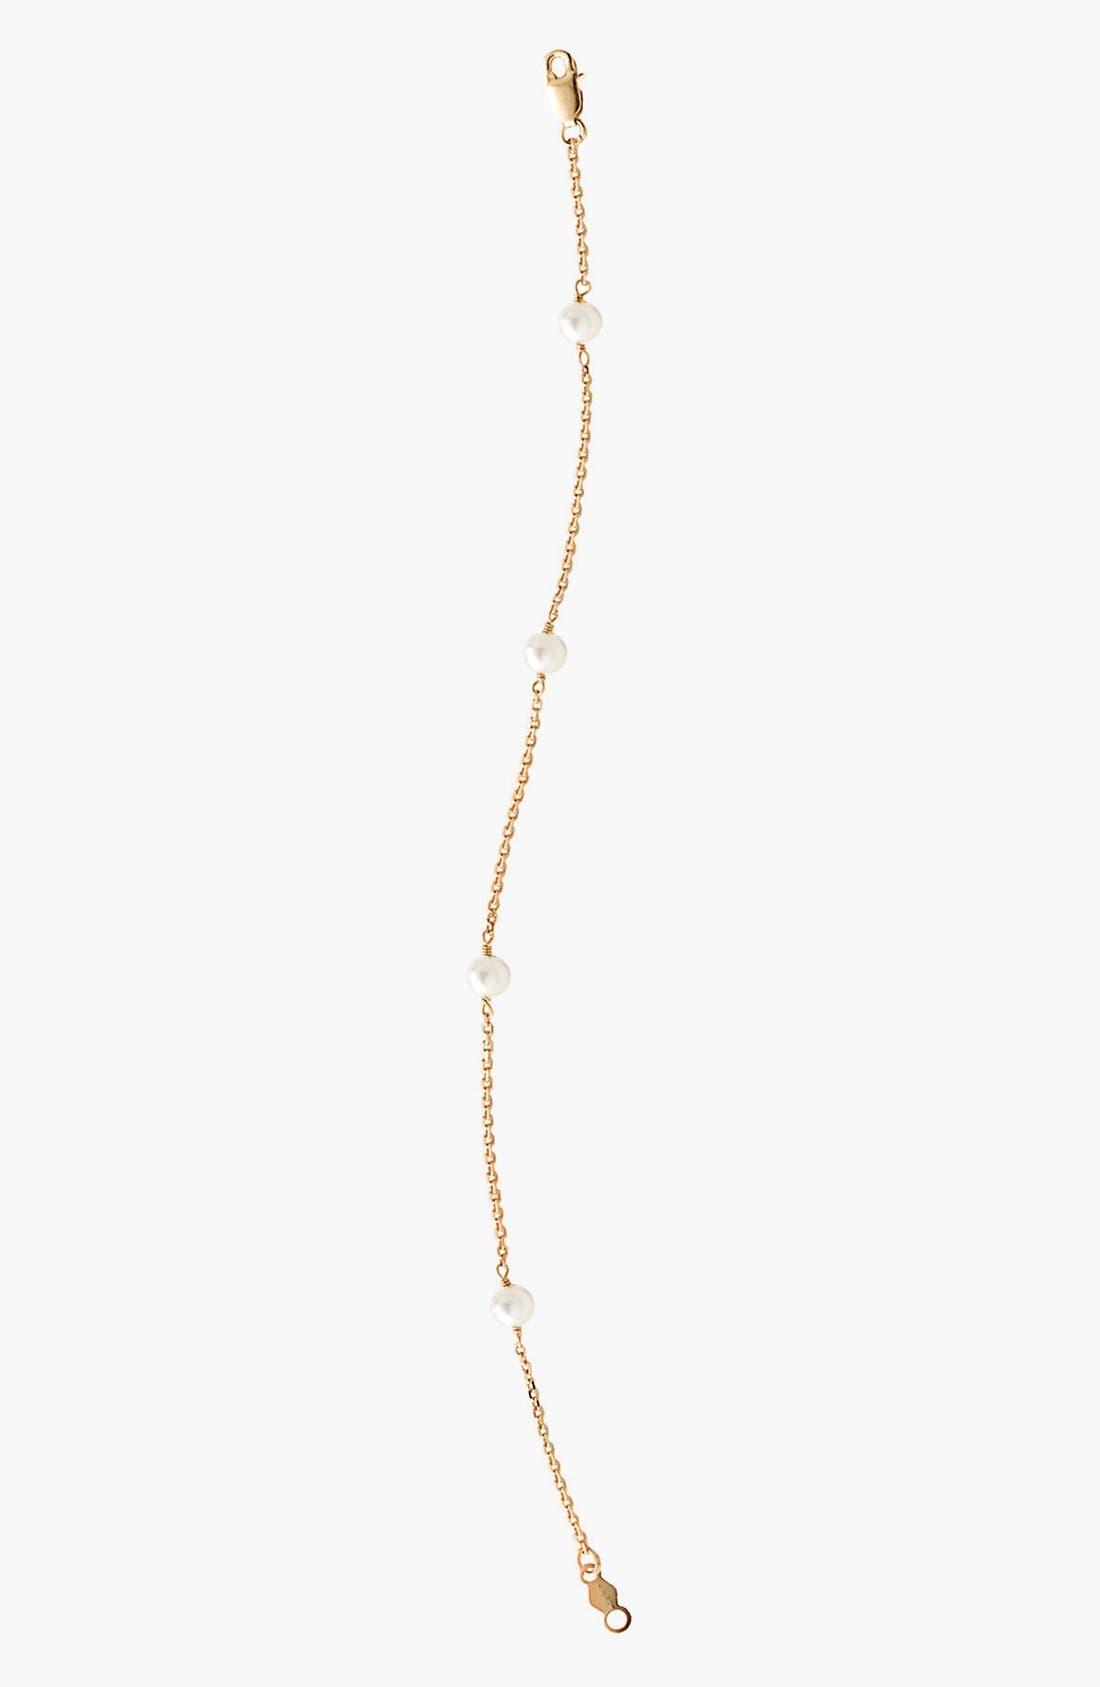 Main Image - Mignonette 14k Gold & Cultured Pearl Bracelet (Toddler Girls)